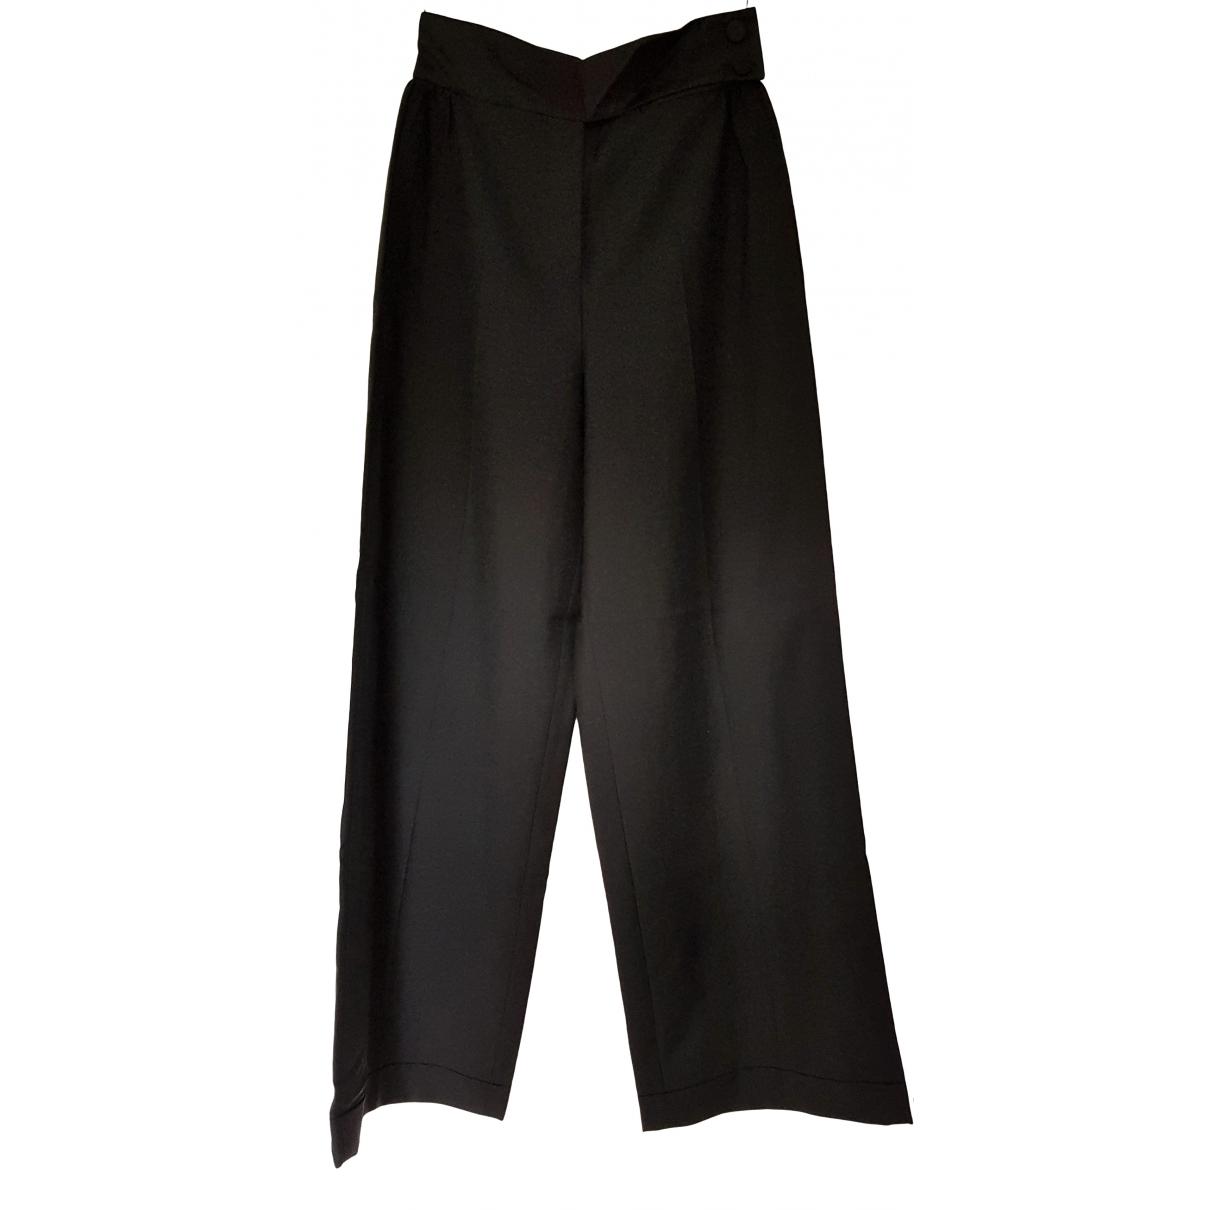 Louis Vuitton \N Black Cotton Trousers for Women 40 FR